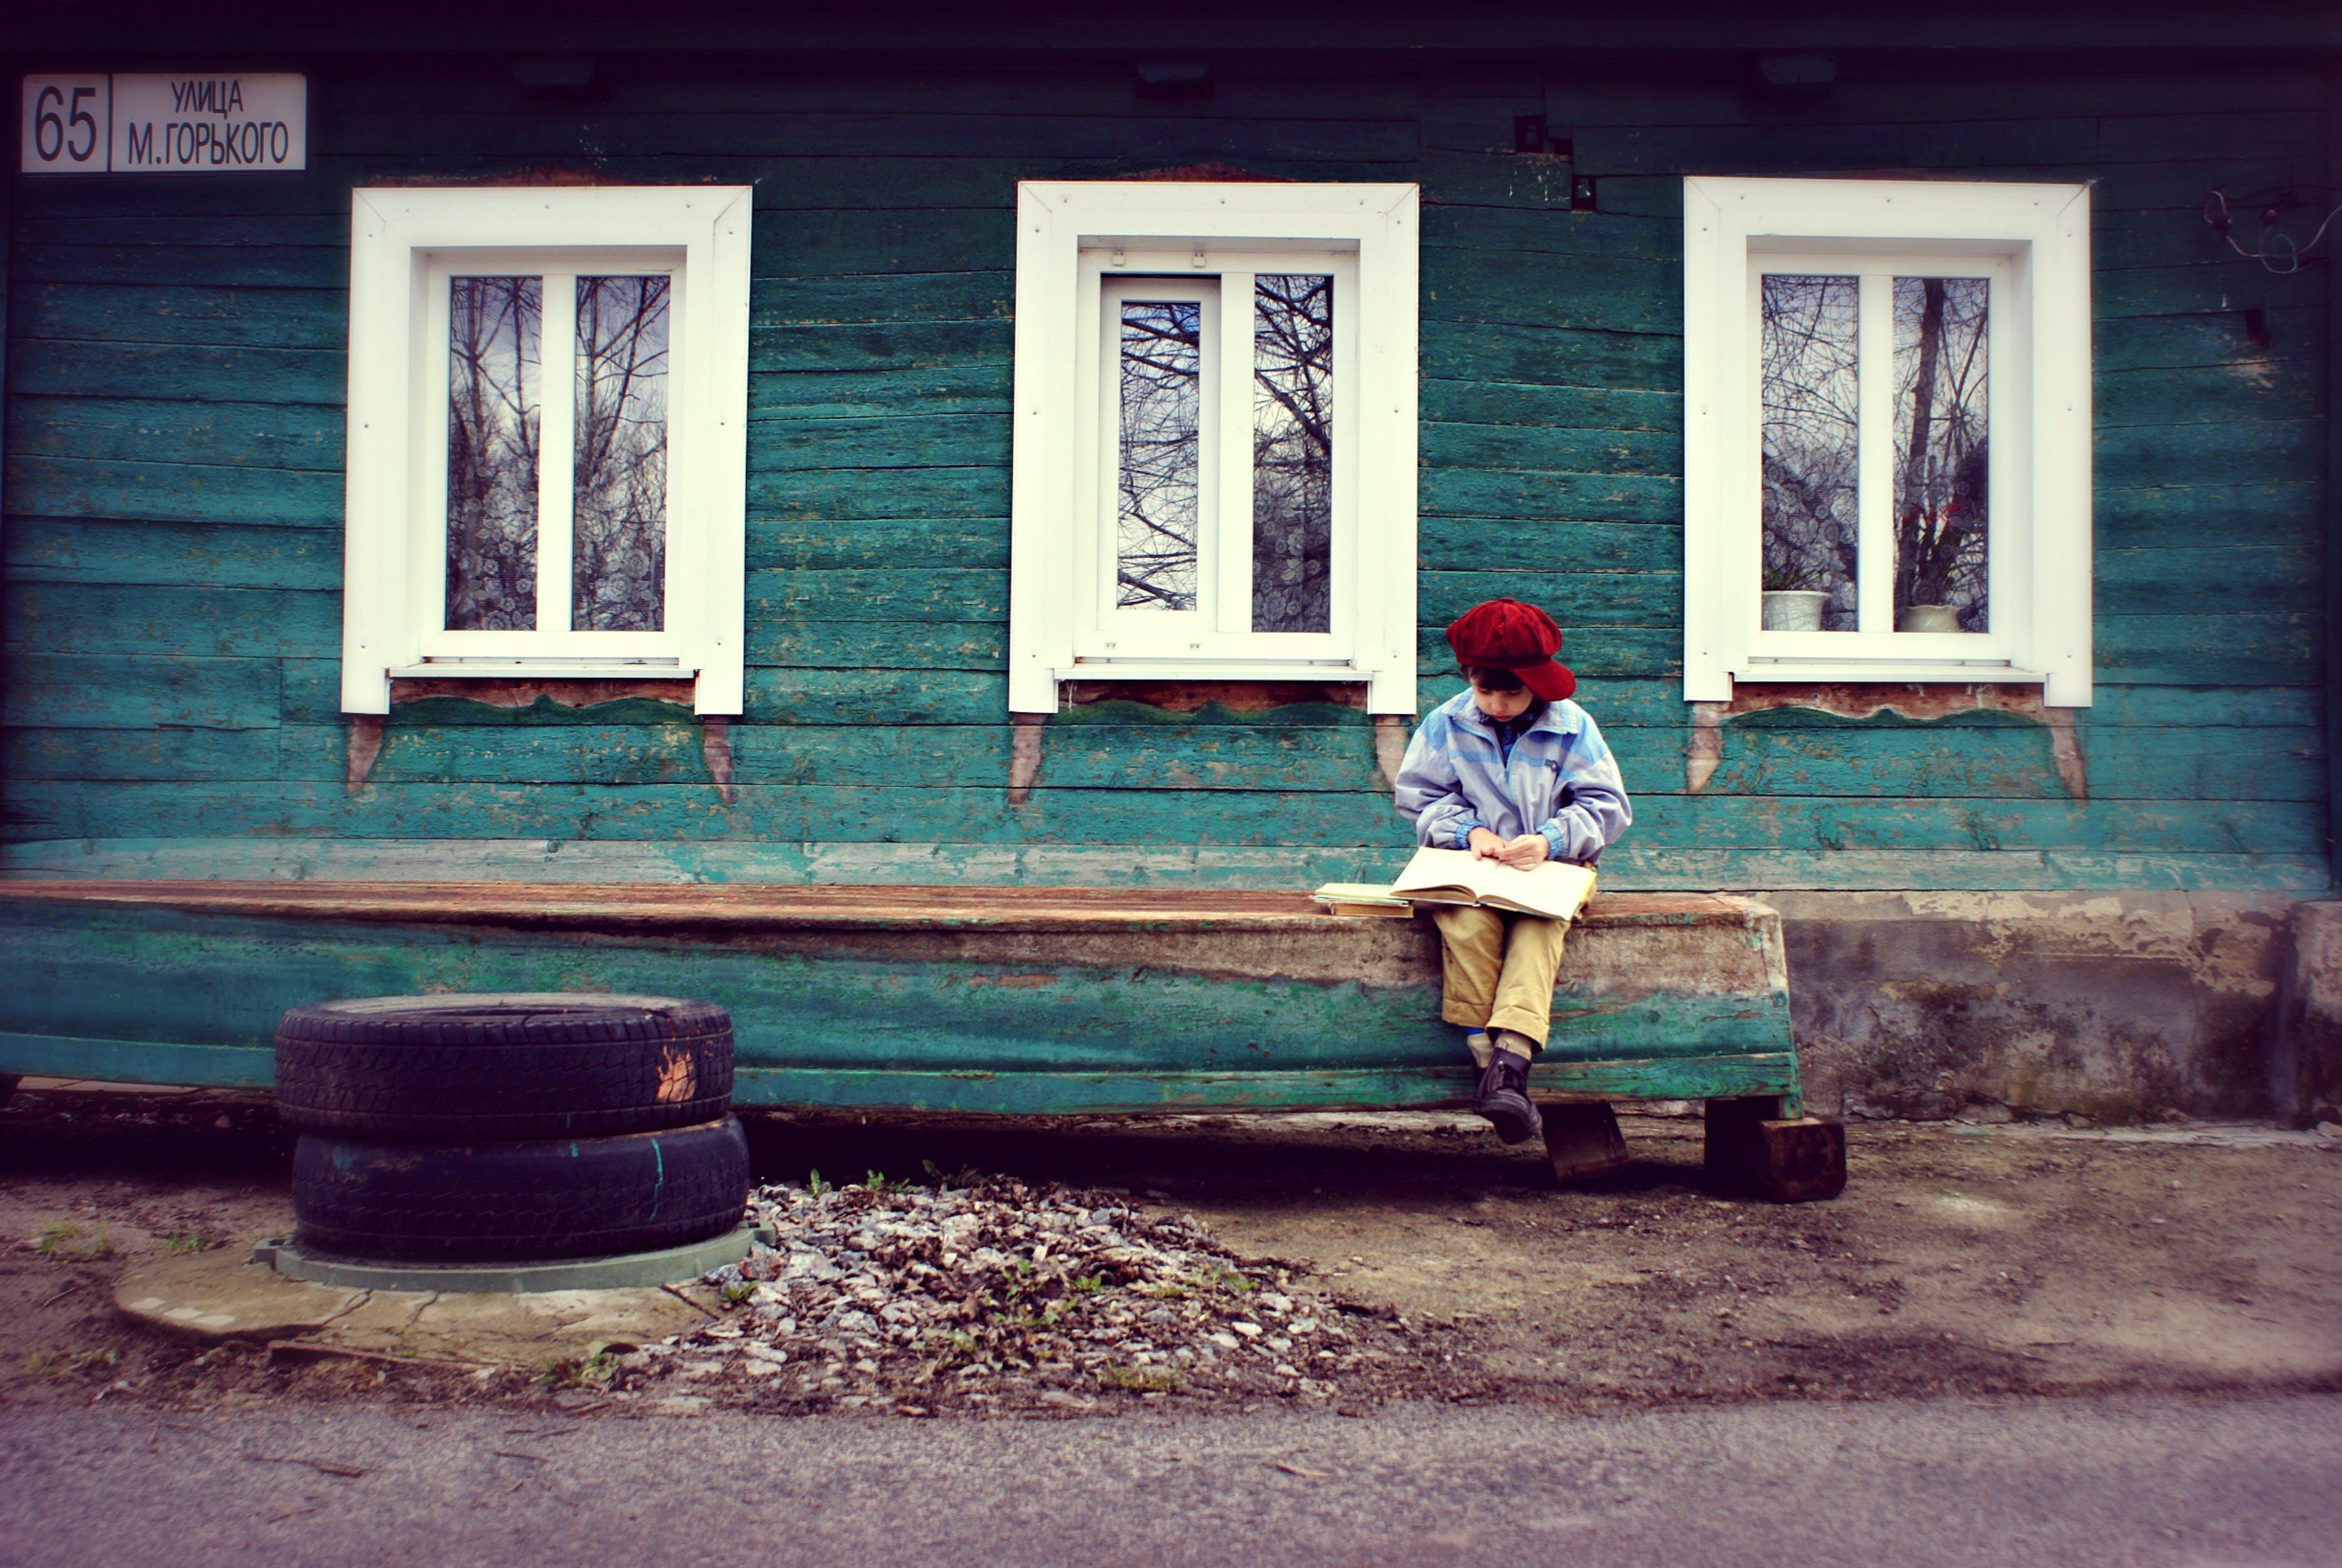 Boy Seating On Bench